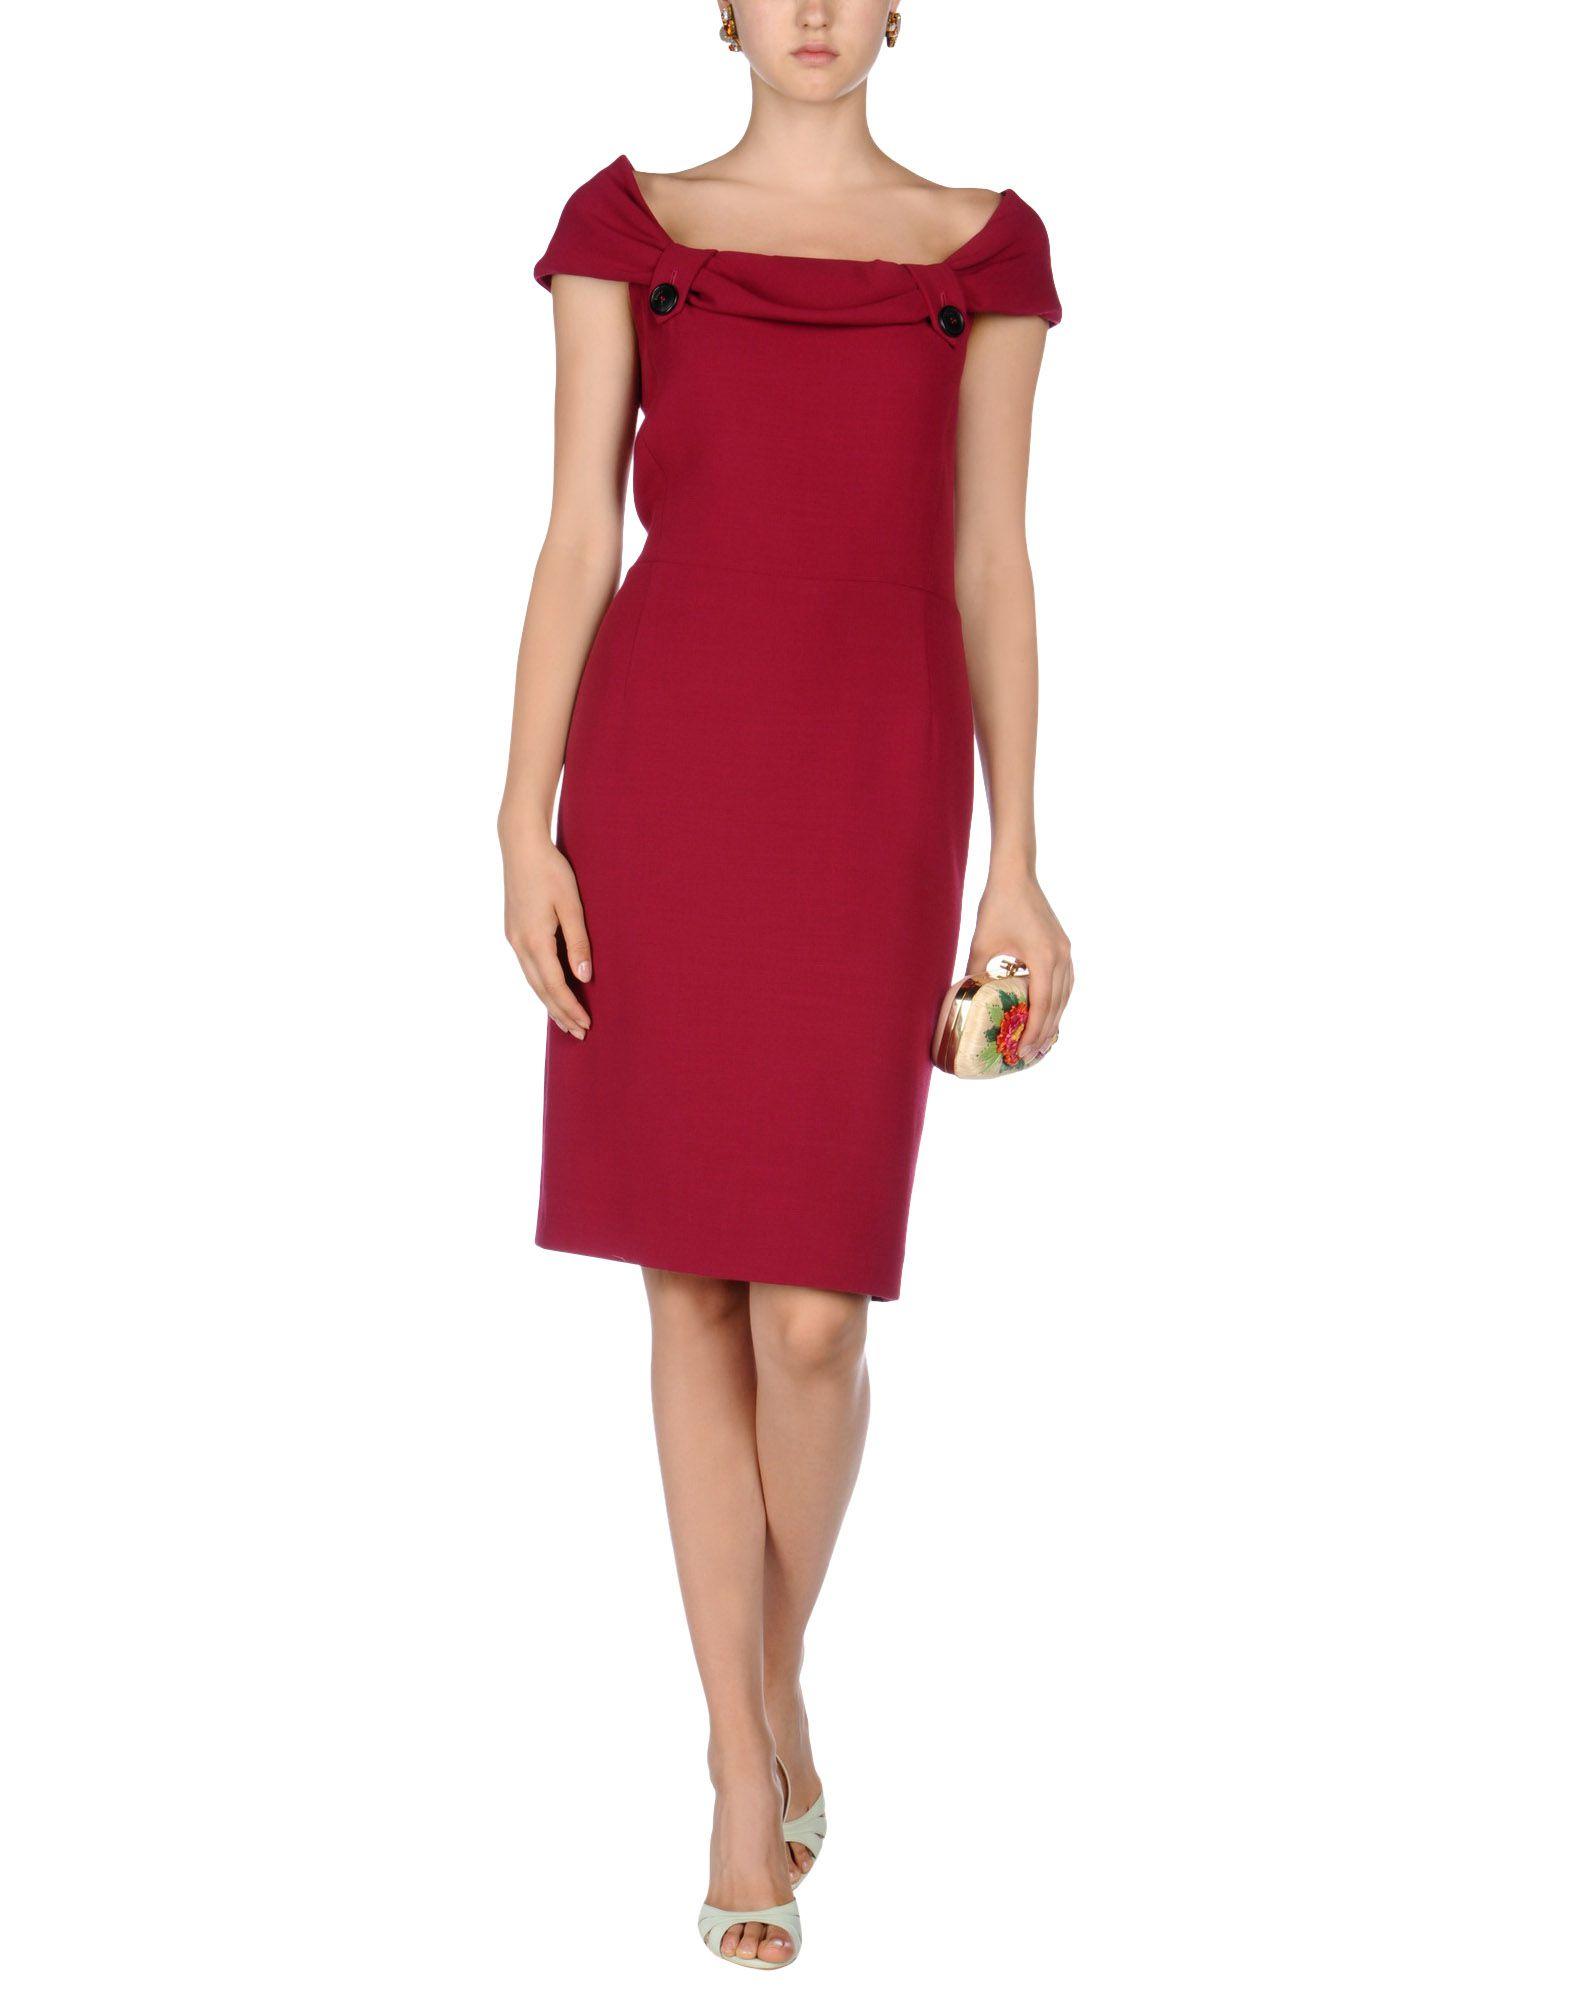 dior short dresses - photo #10